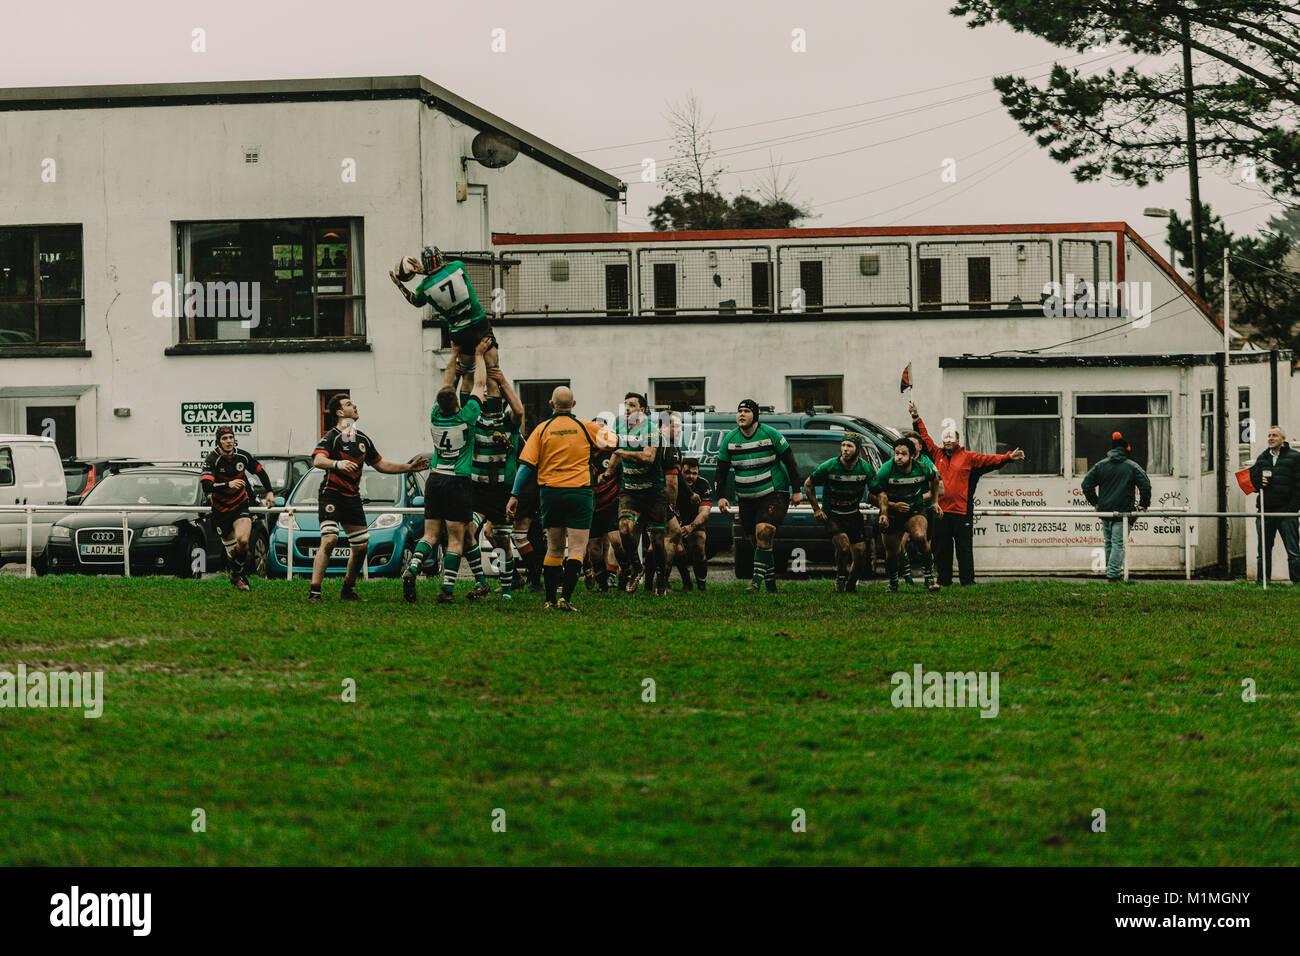 Penryn RFC vs Hayle RFC at The Memorial Stadium, Penryn, Cornwall, UK, 27th January 2018 Stock Photo